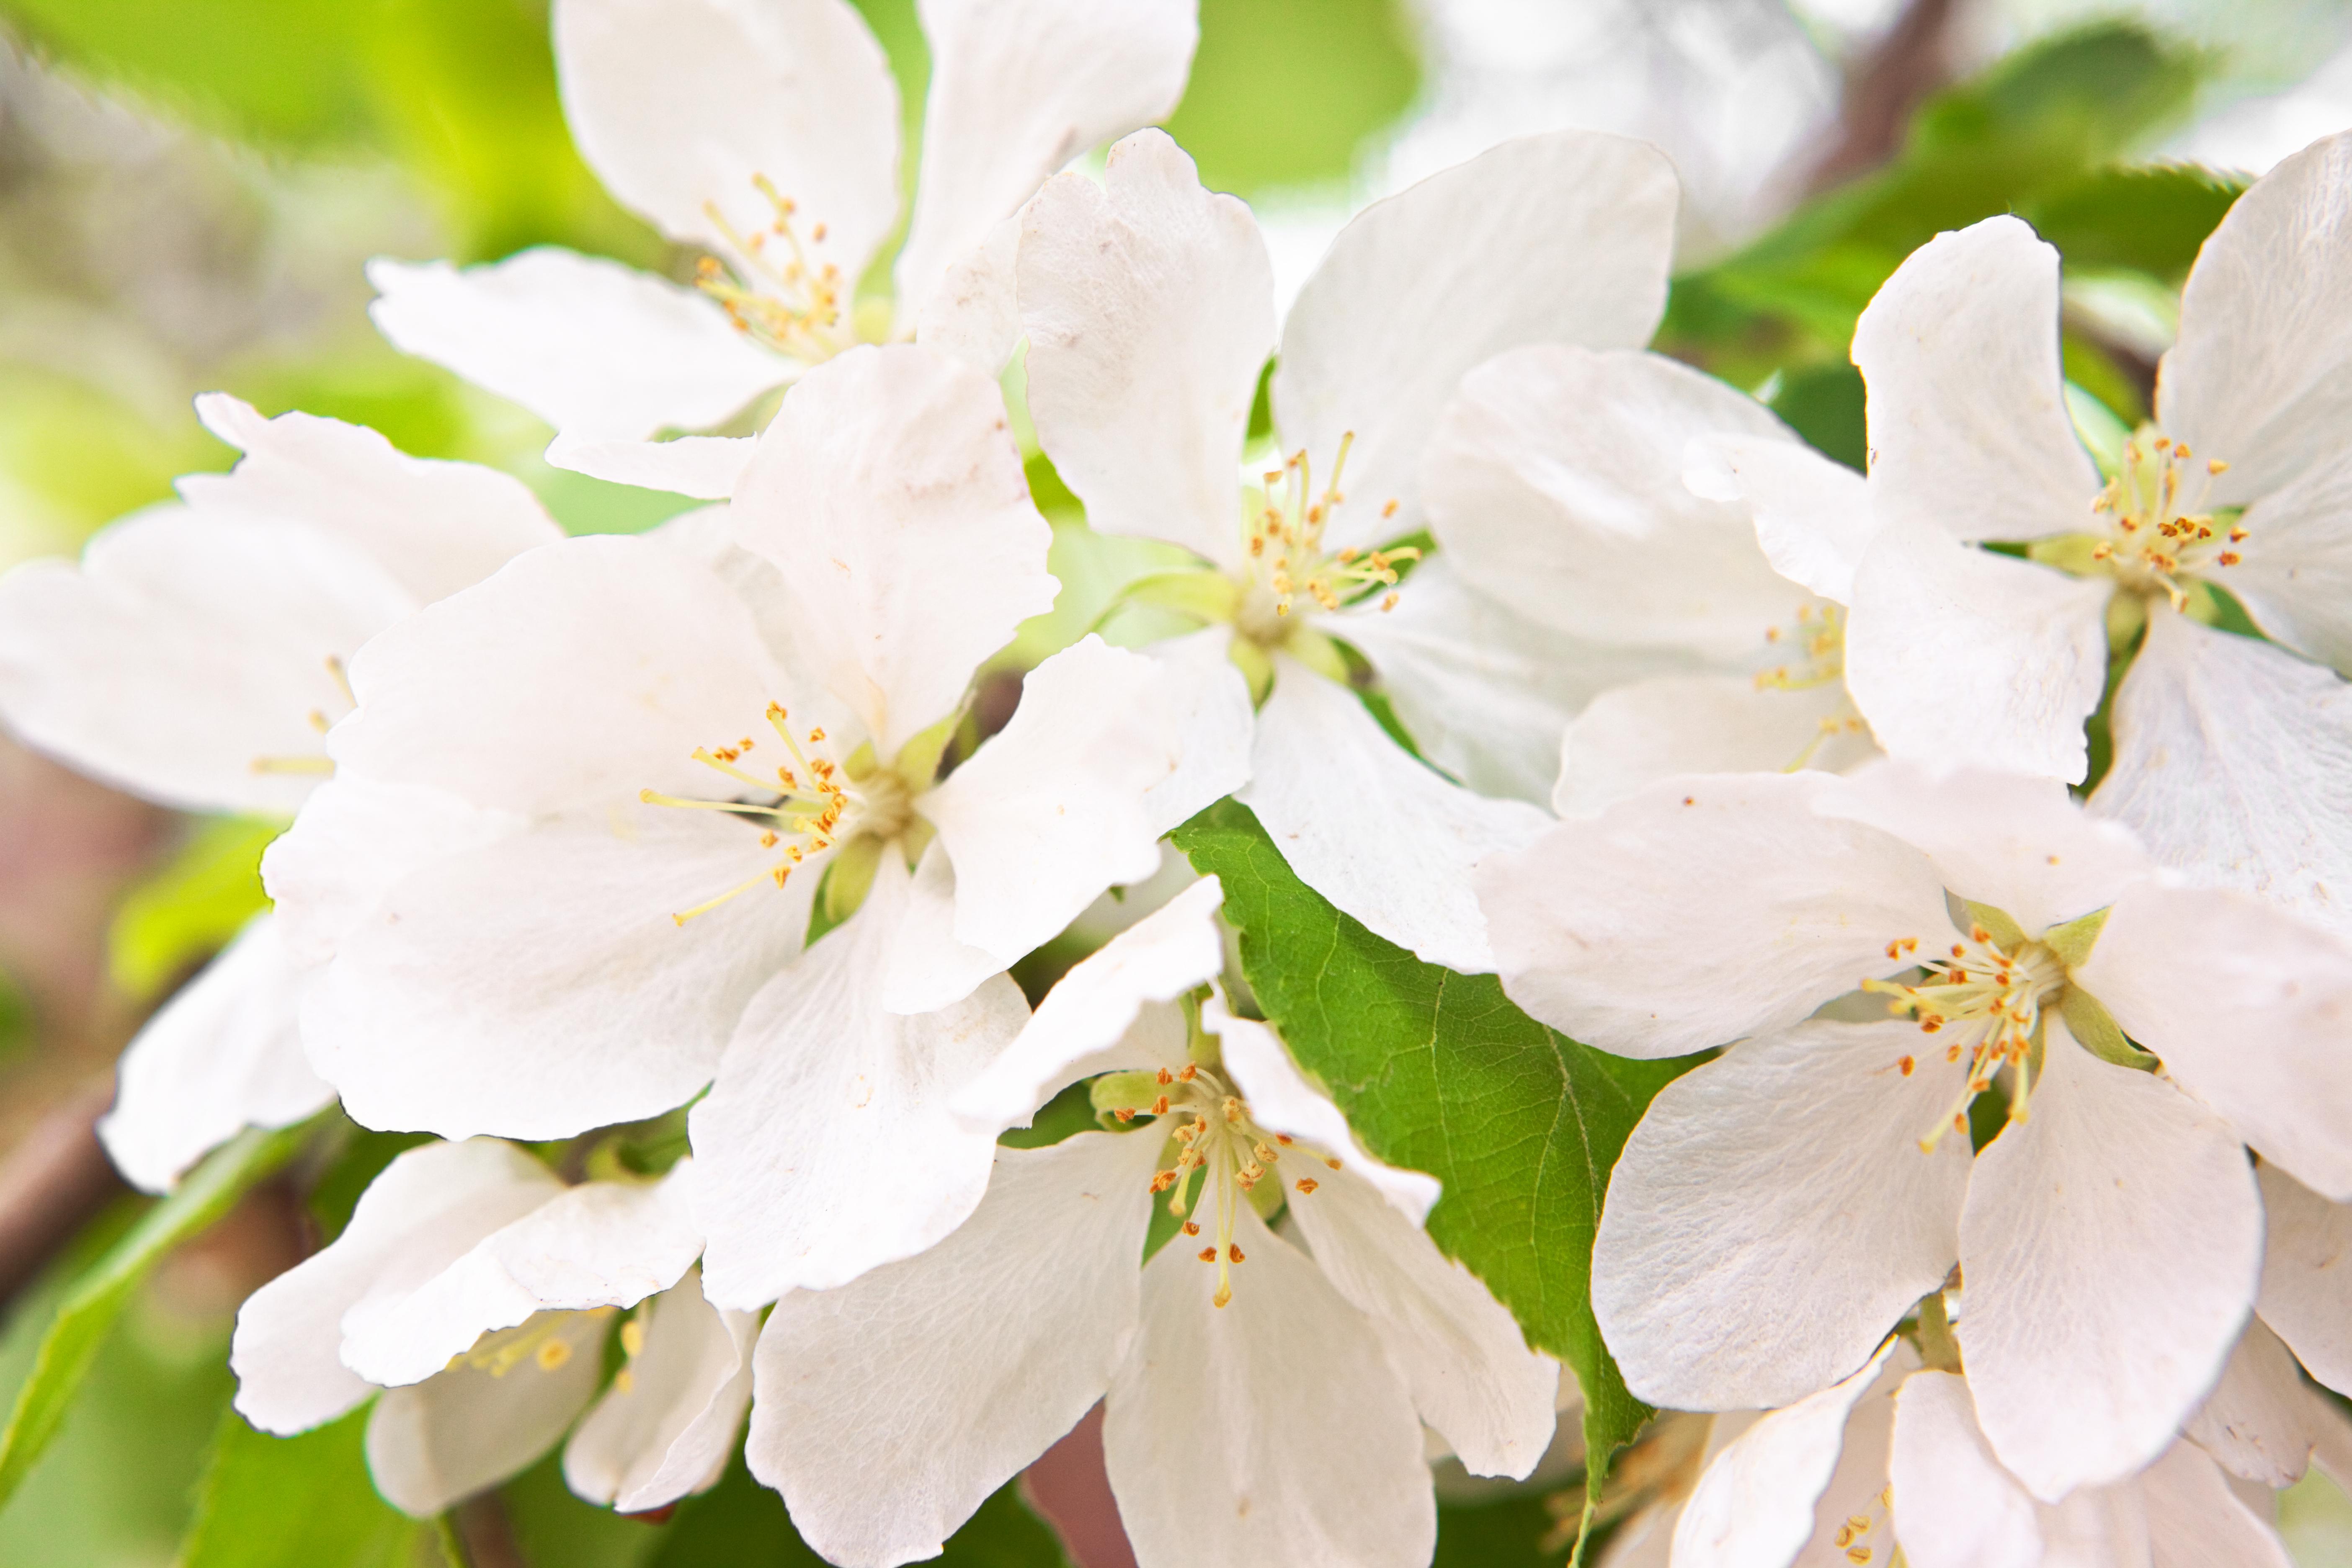 White flower in bloom photo